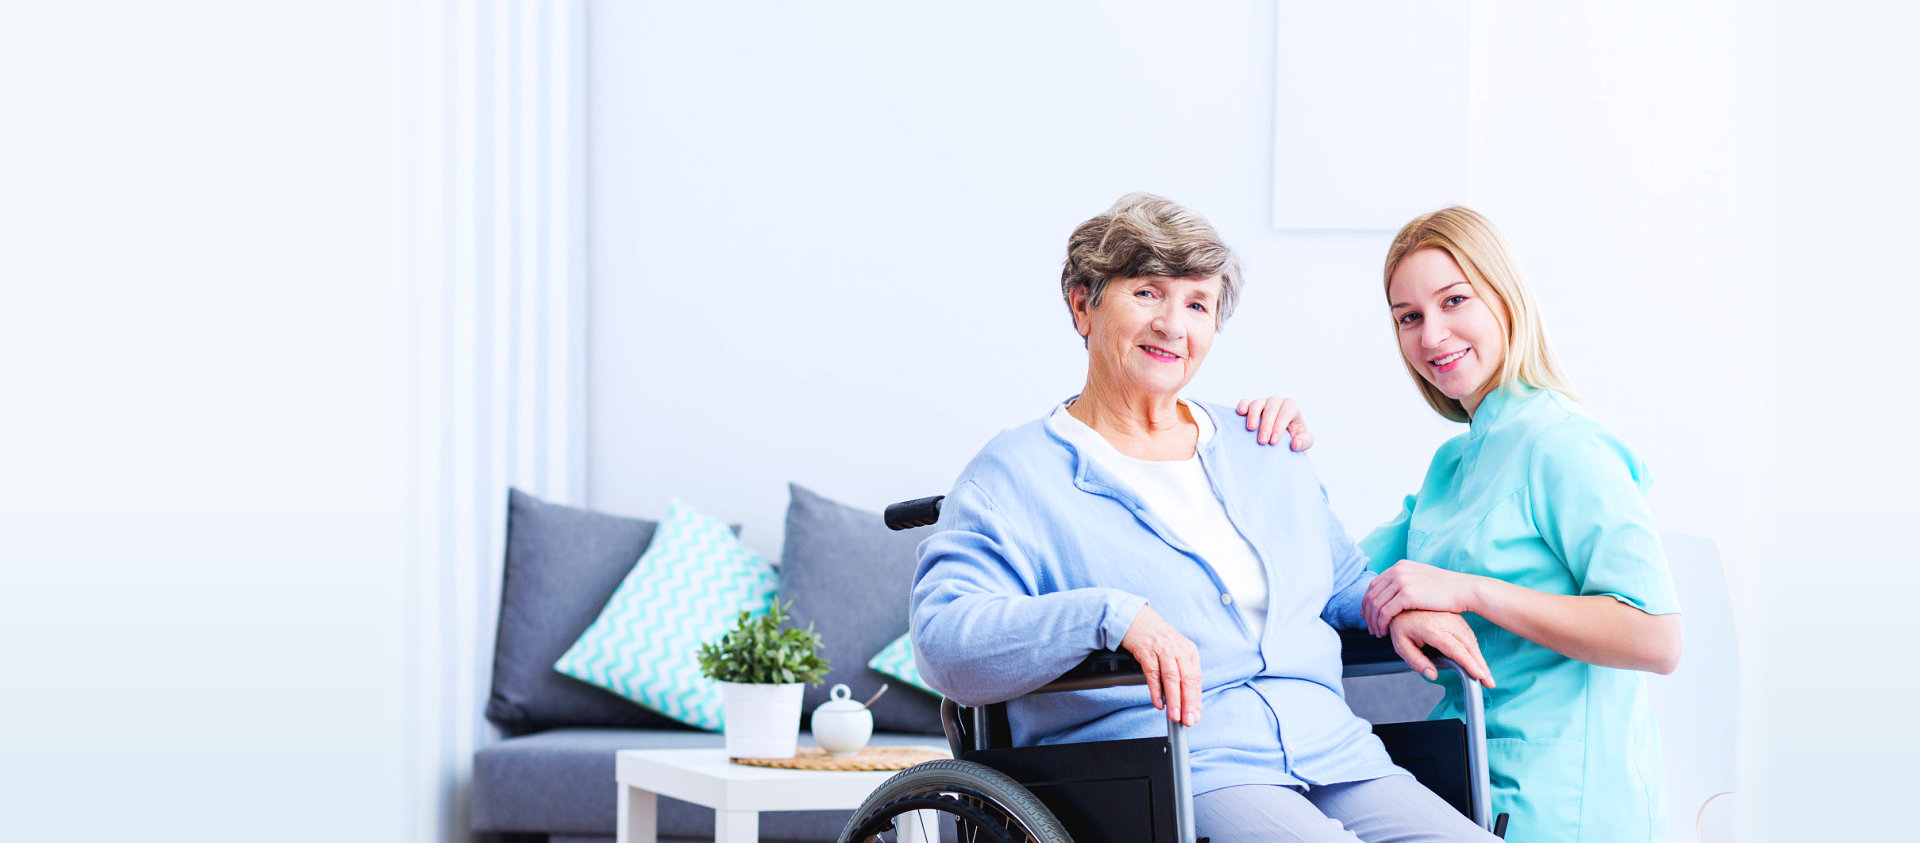 senior woman on a wheelchair smiling